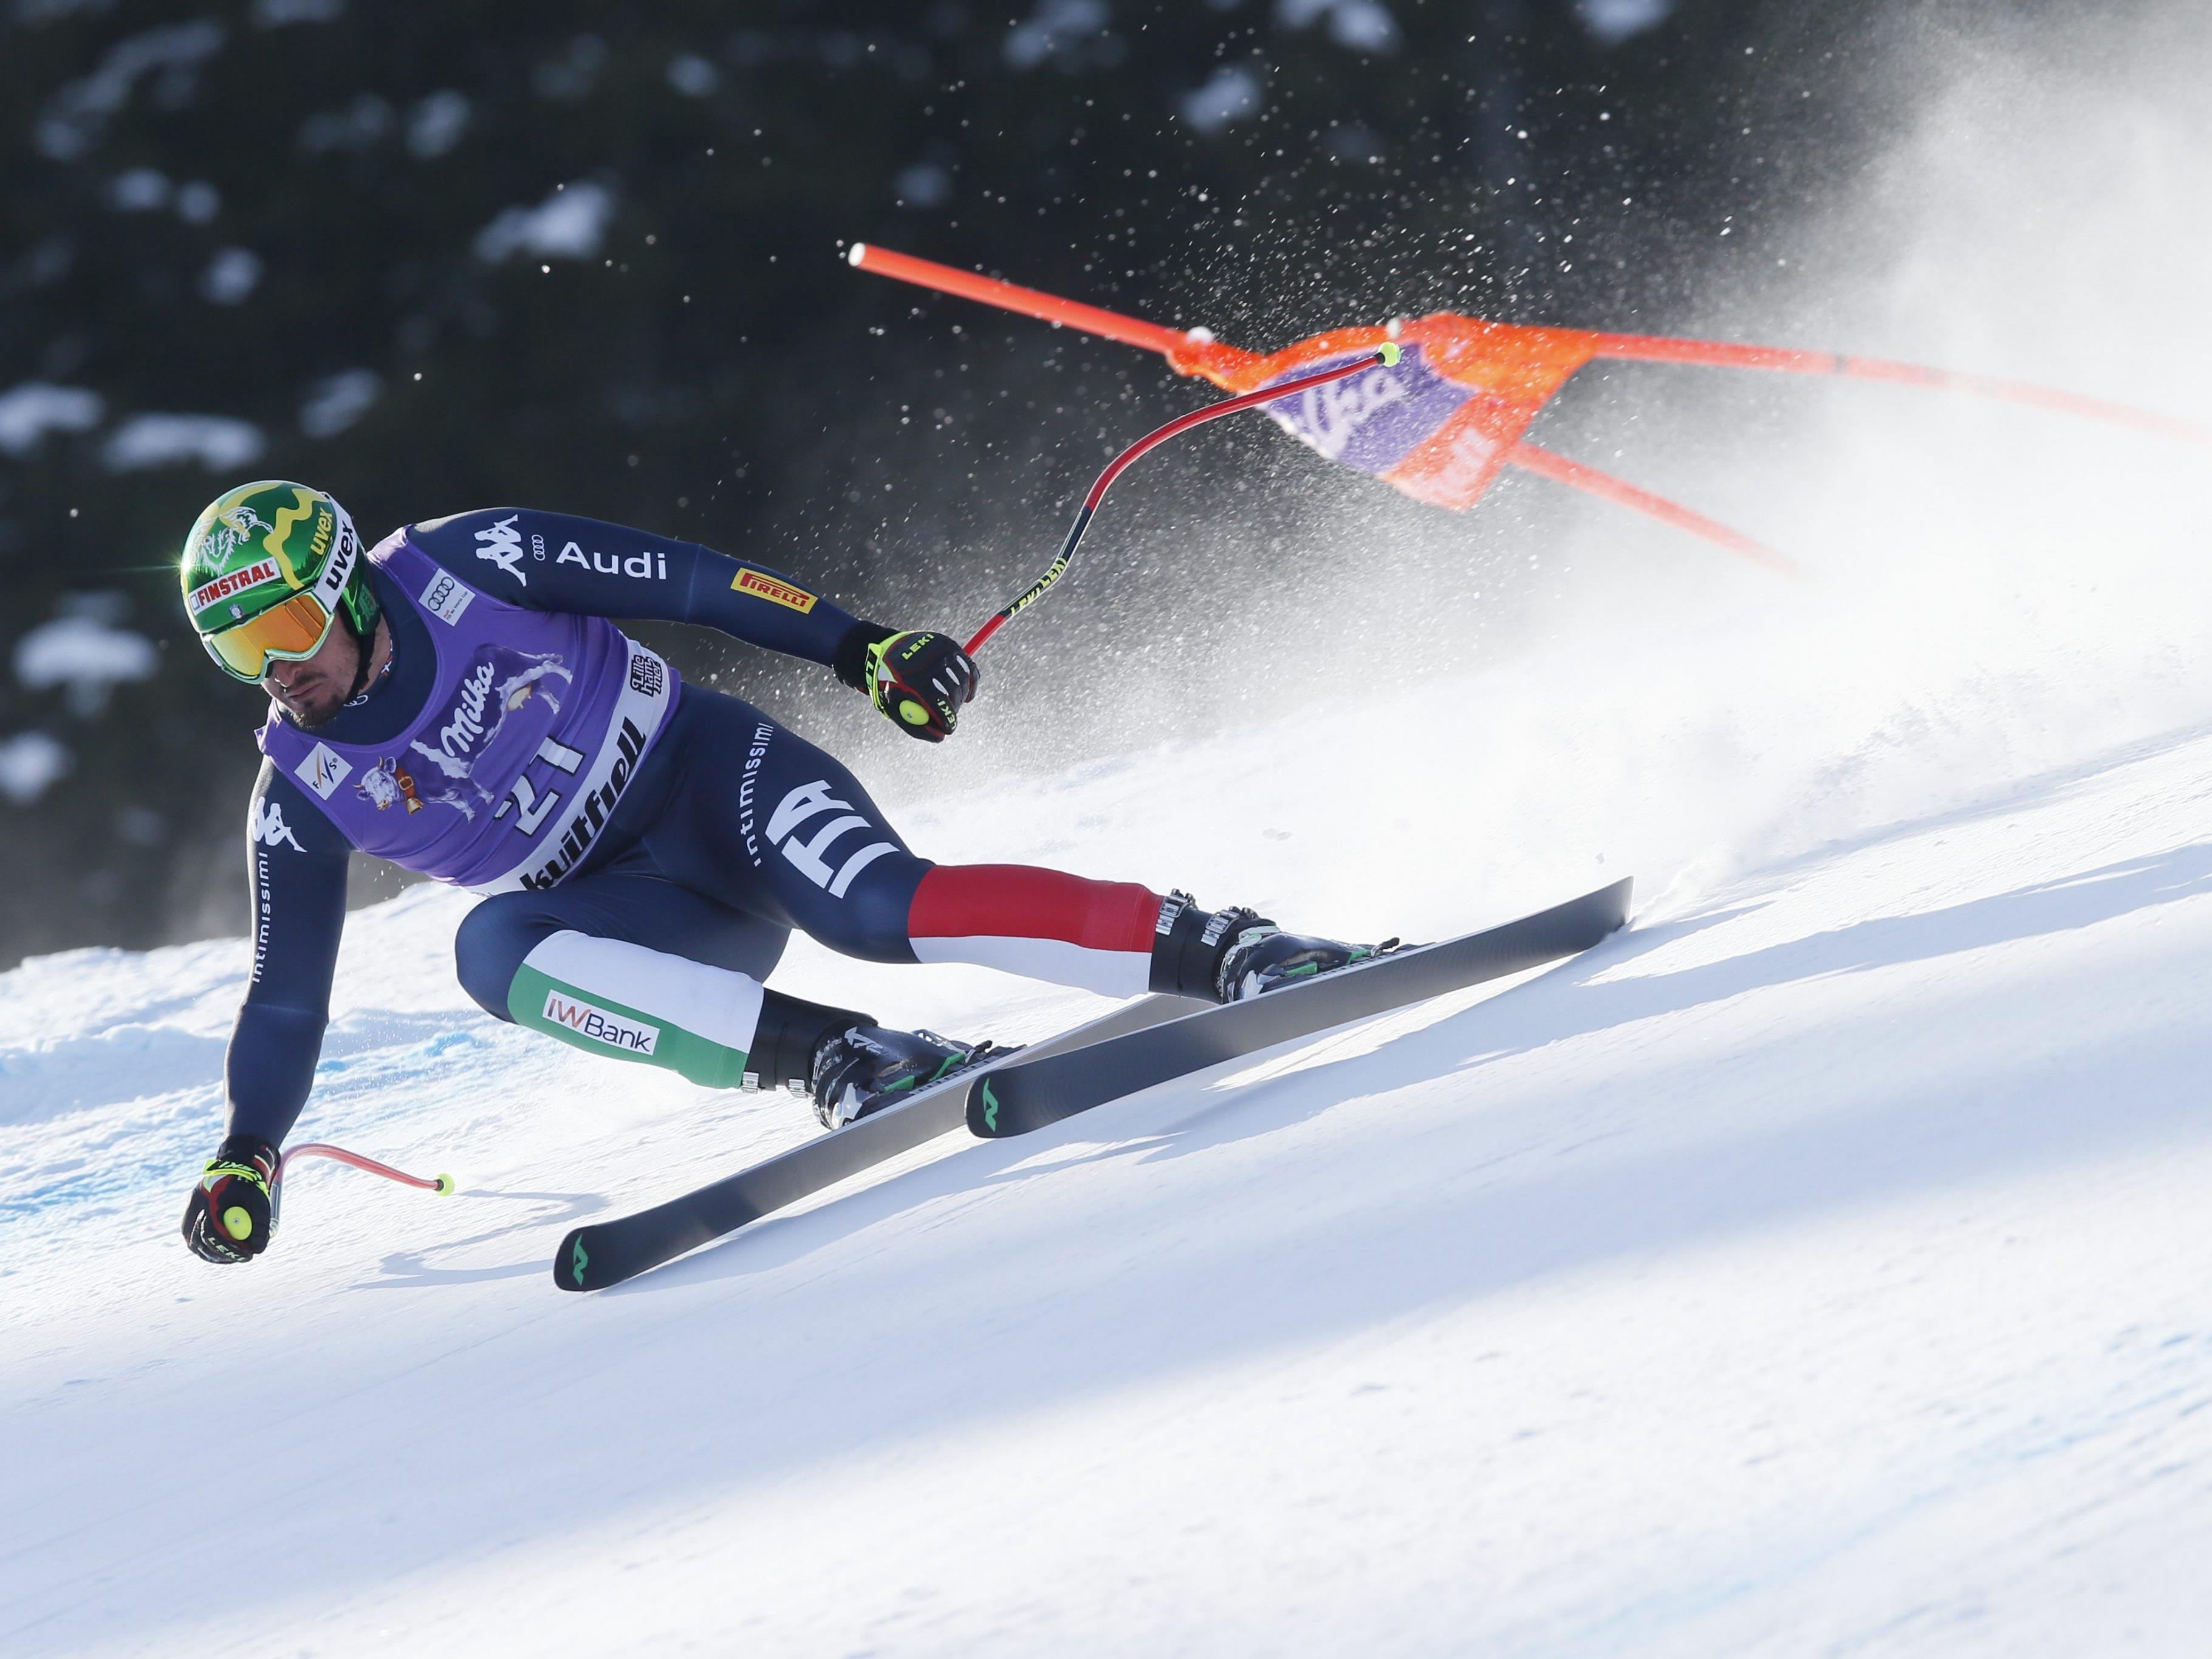 Paris-Sieg in Kvitfjell - Fill übernahm Führung in Disziplinwertung